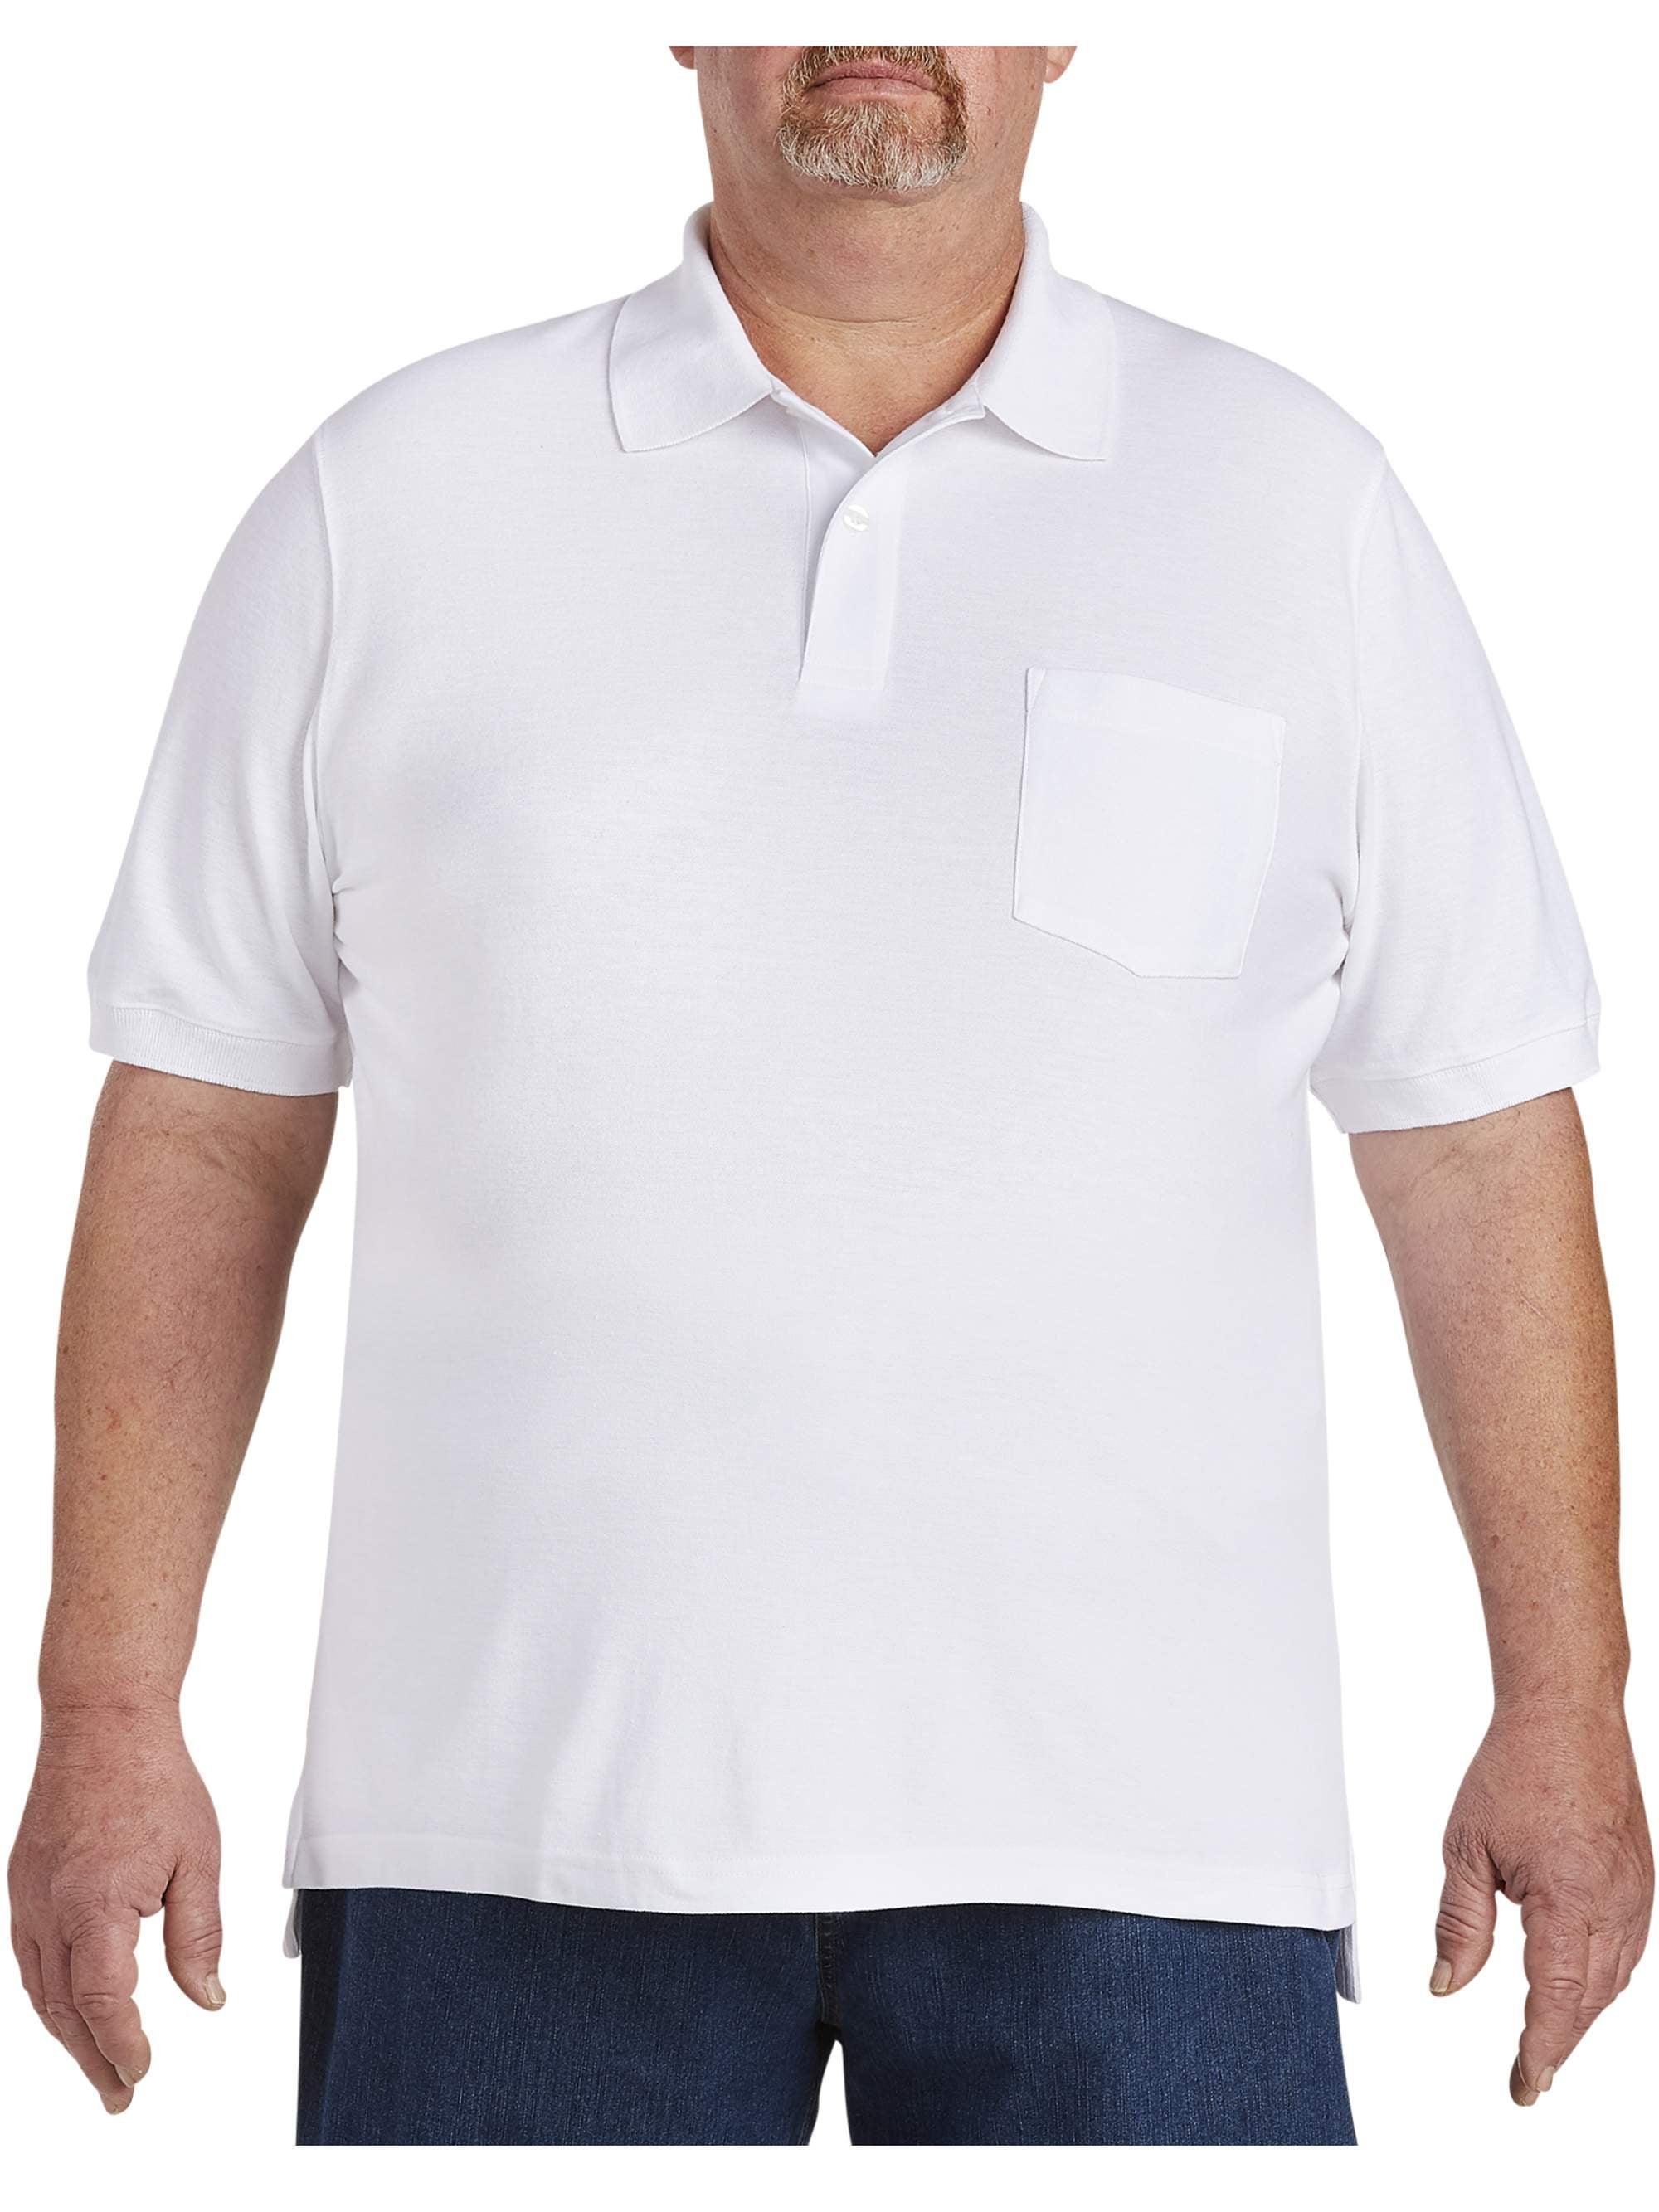 Canyon Ridge - Canyon Ridge Men's Big & Tall Pocket Pique Polo Shirt - Walmart.com